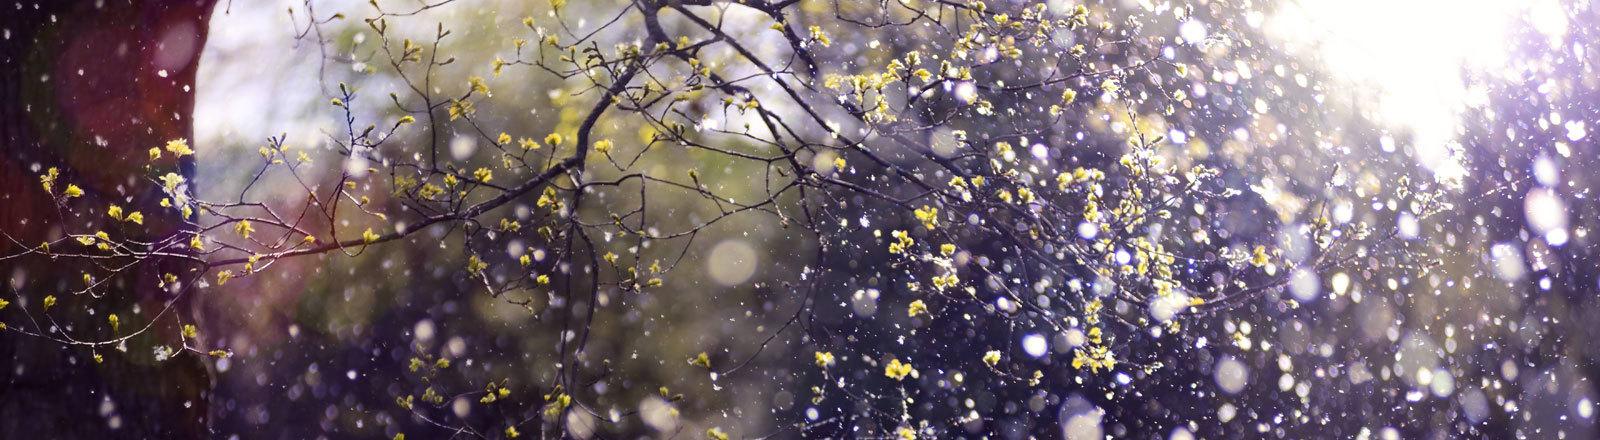 Fliegende Pollen.